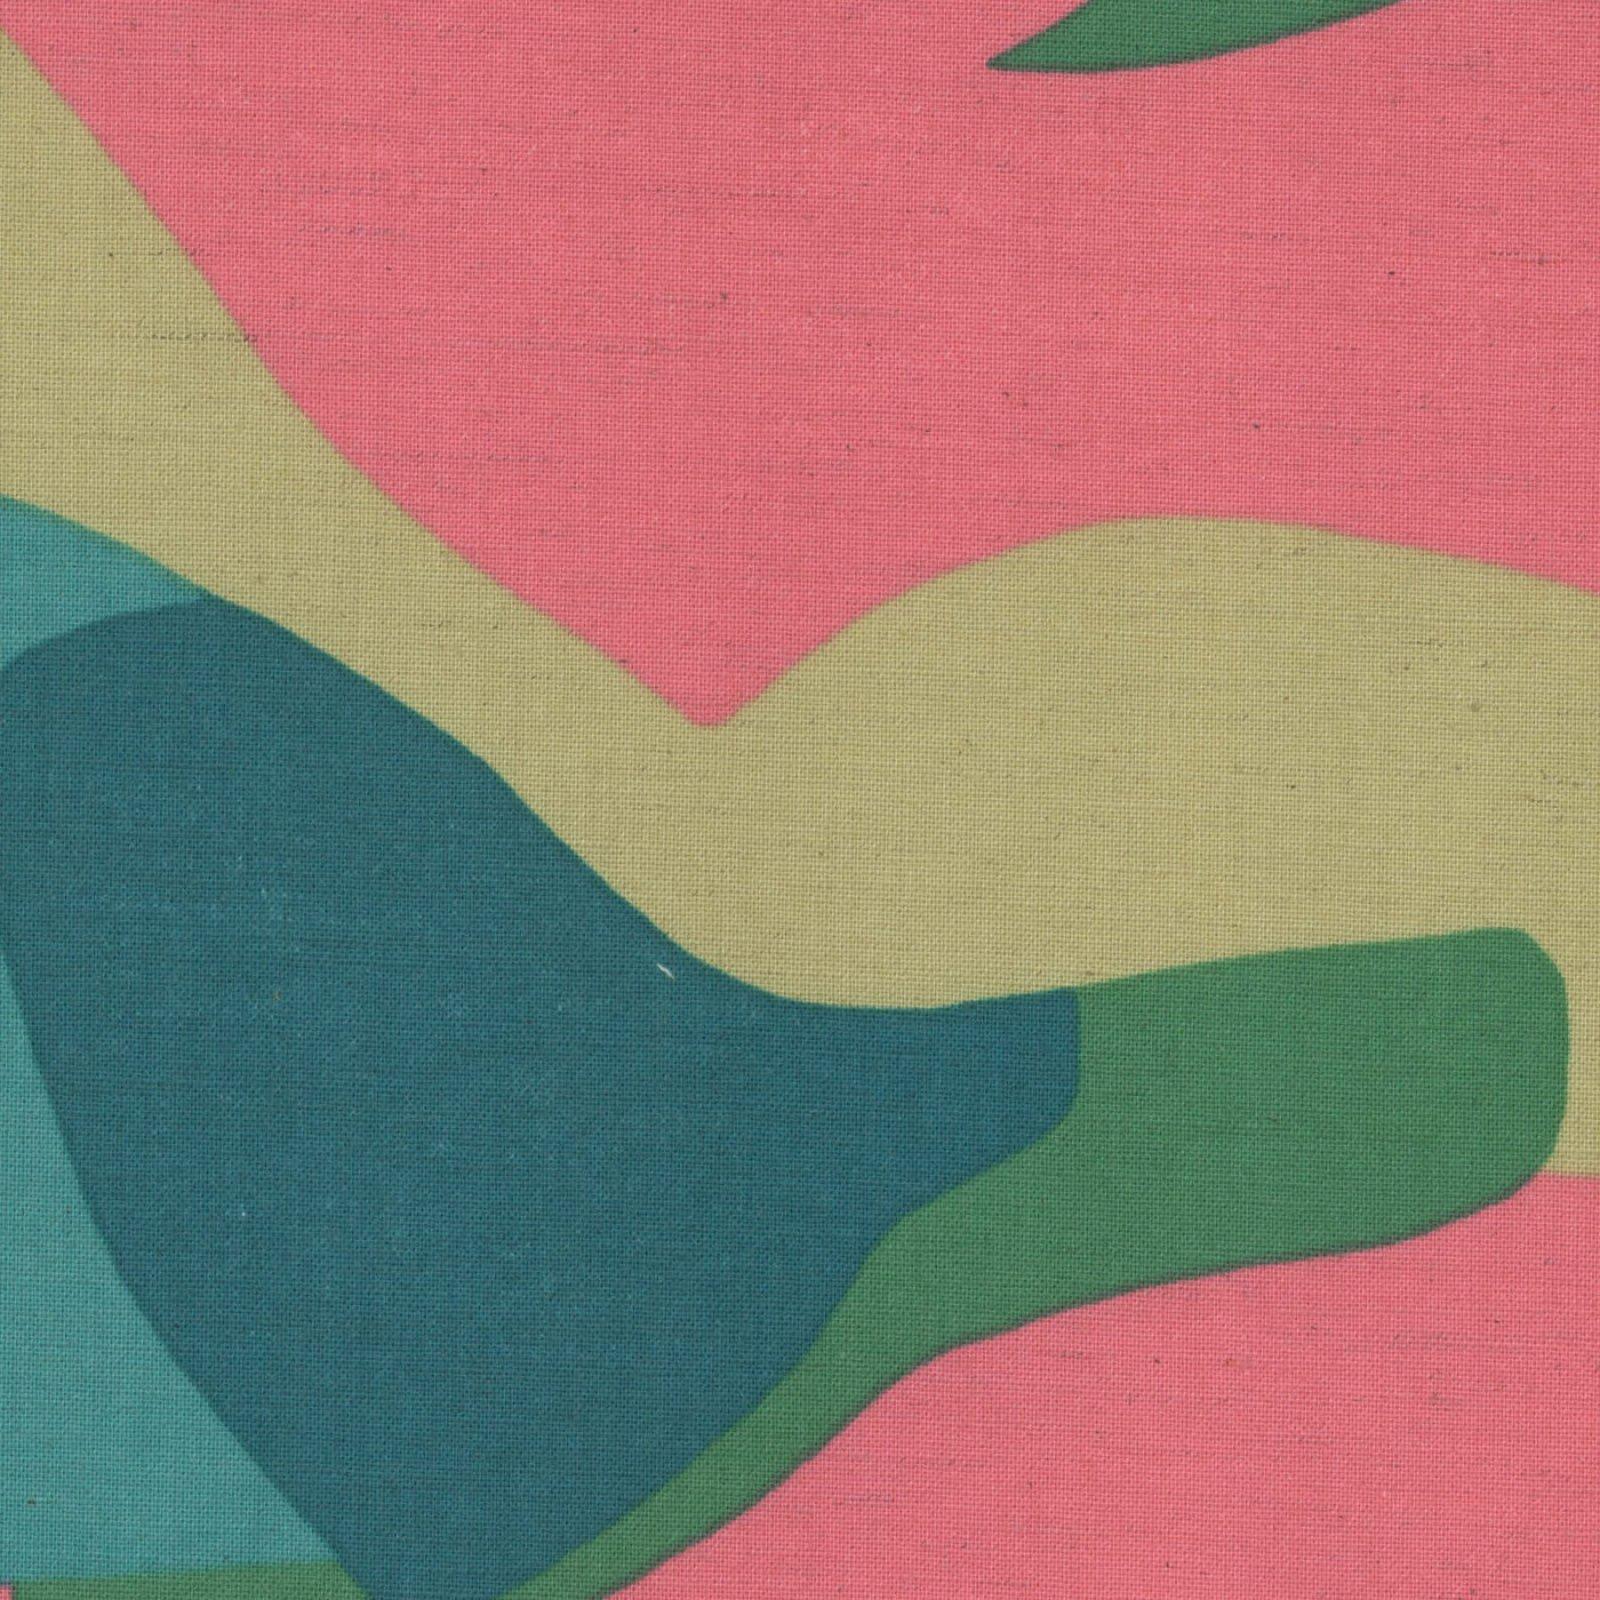 Kokka - Koto Thouin Cotton/Linen Sheeting - Pink